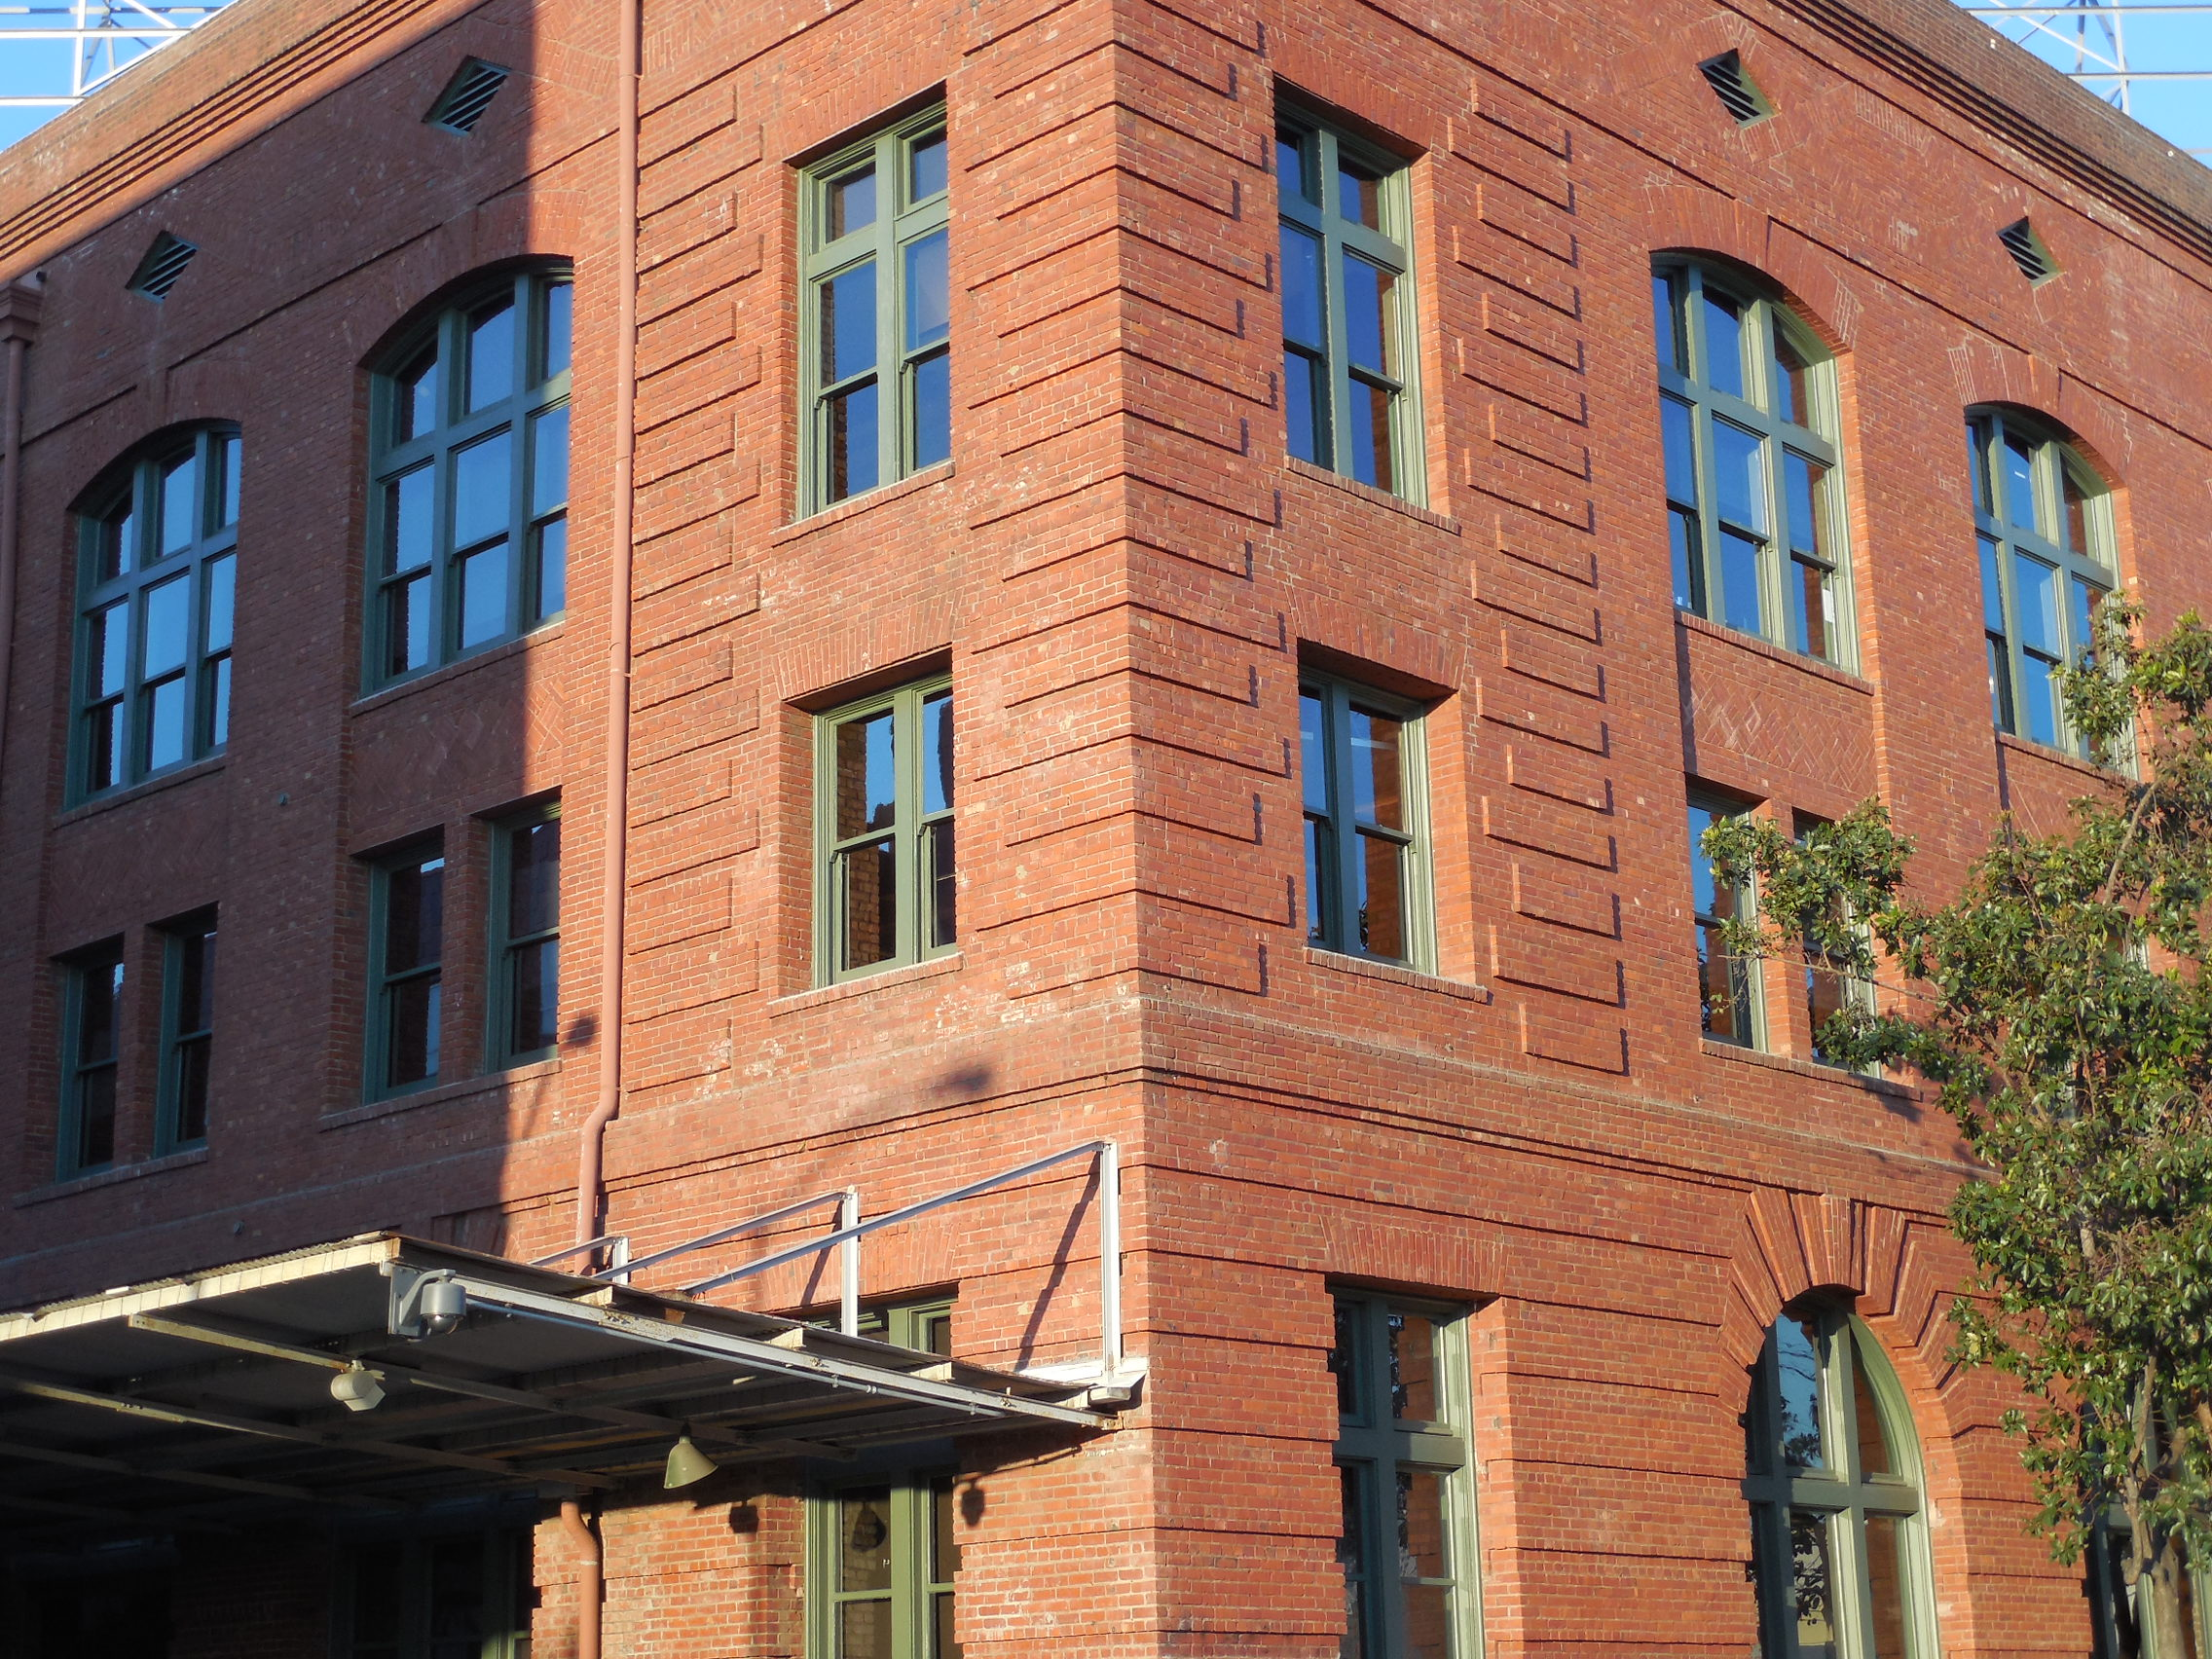 Brick Seismic Upgrades